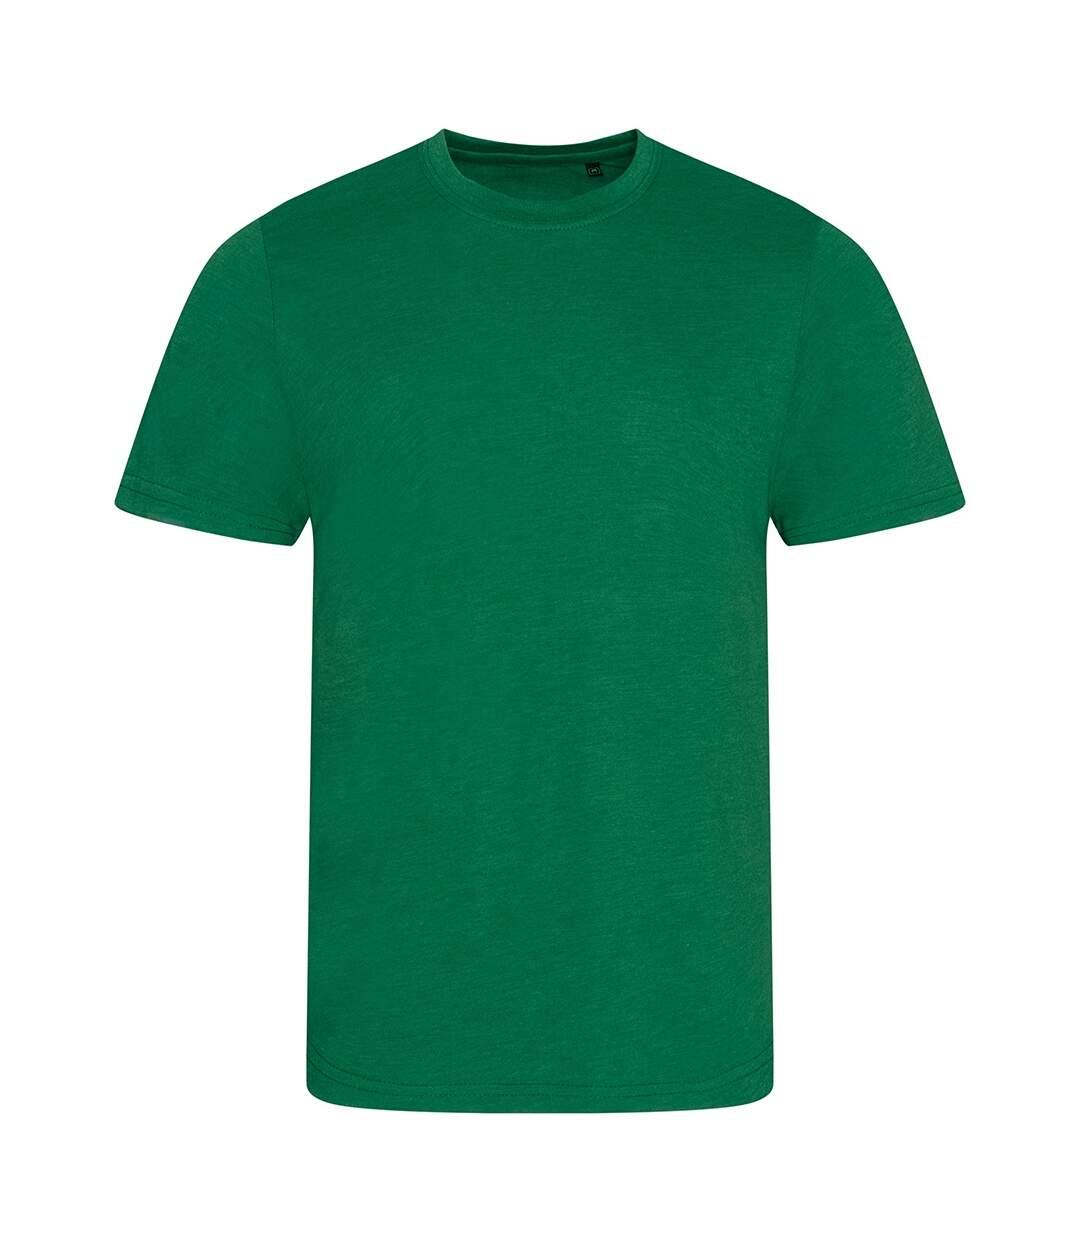 AWDis Mens Tri Blend T Shirt (Heather Bottle) - UTPC2894